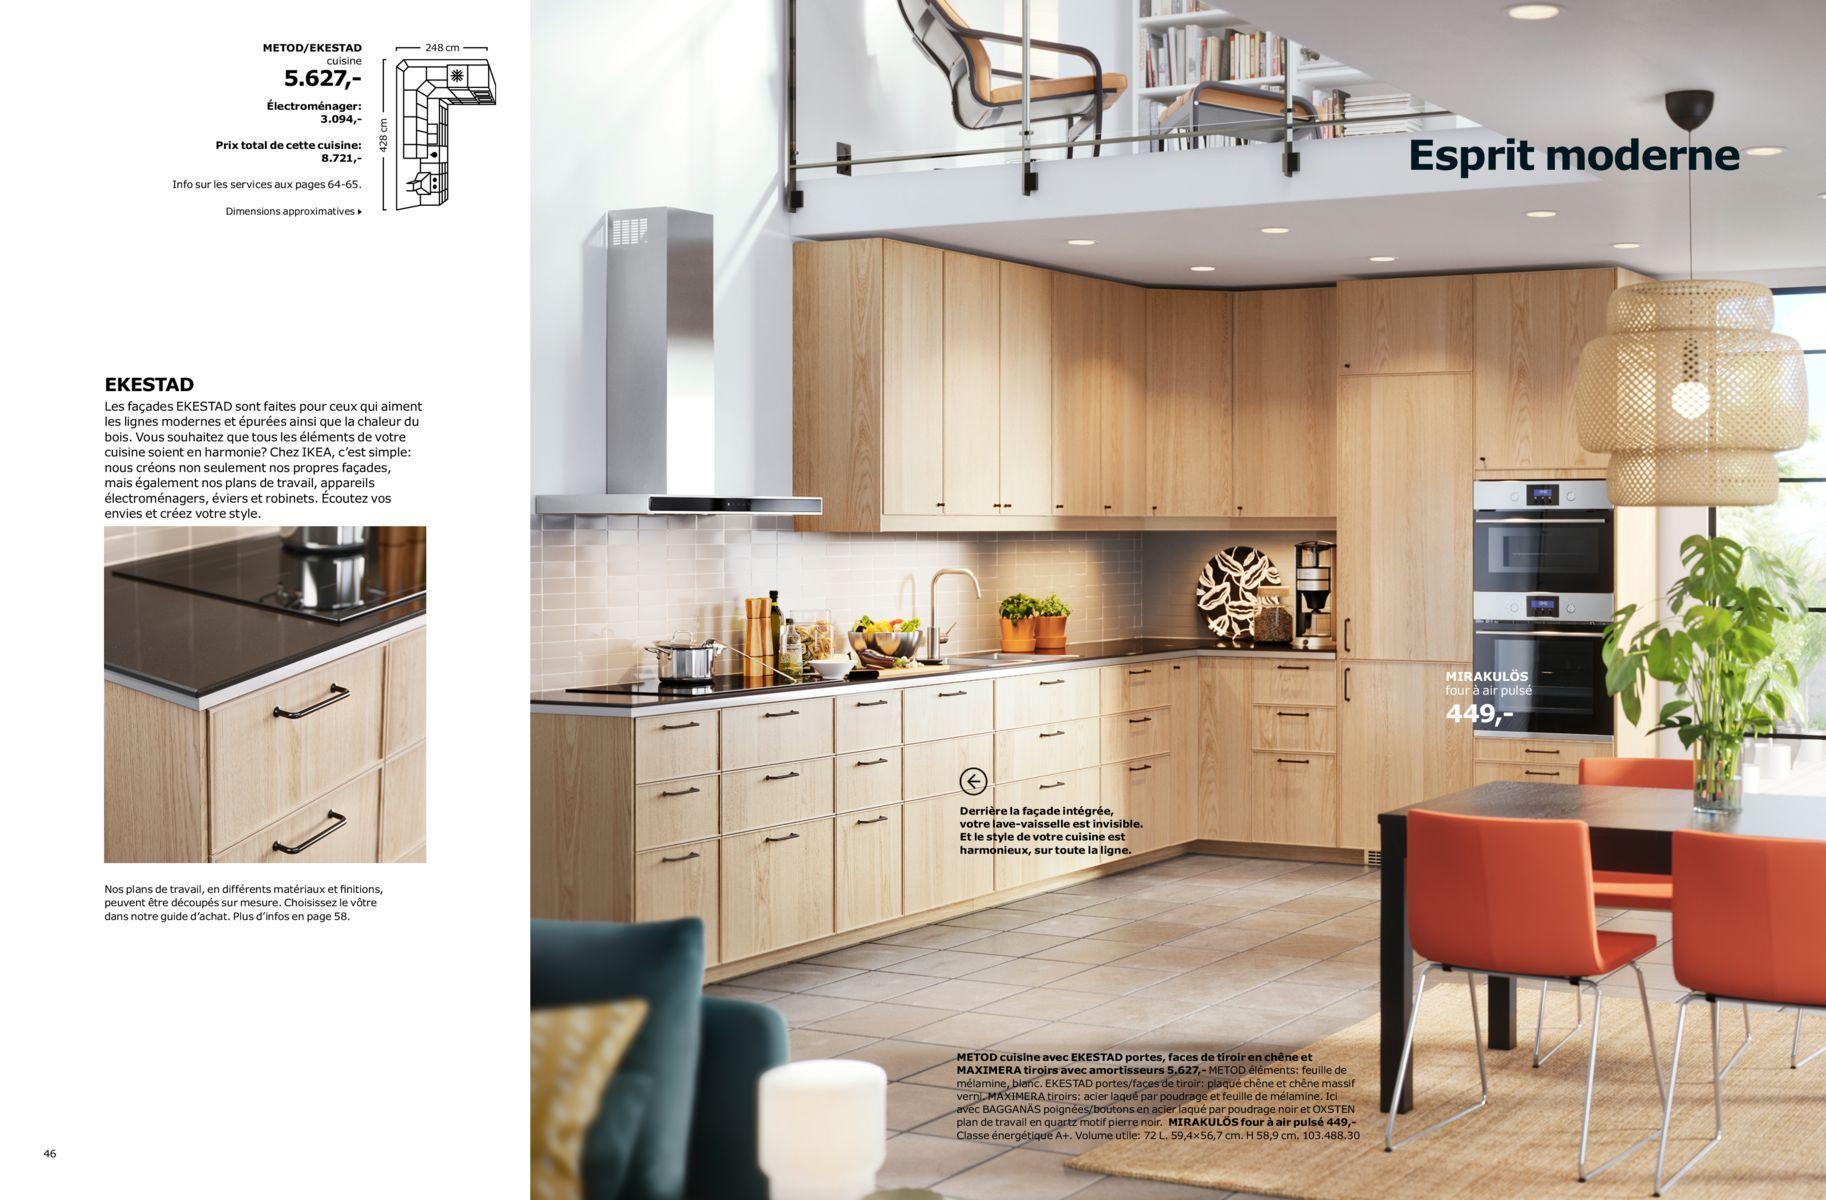 Kitchen Brochure 2018 Ikea Keuken Keukens Keuken Ontwerpen